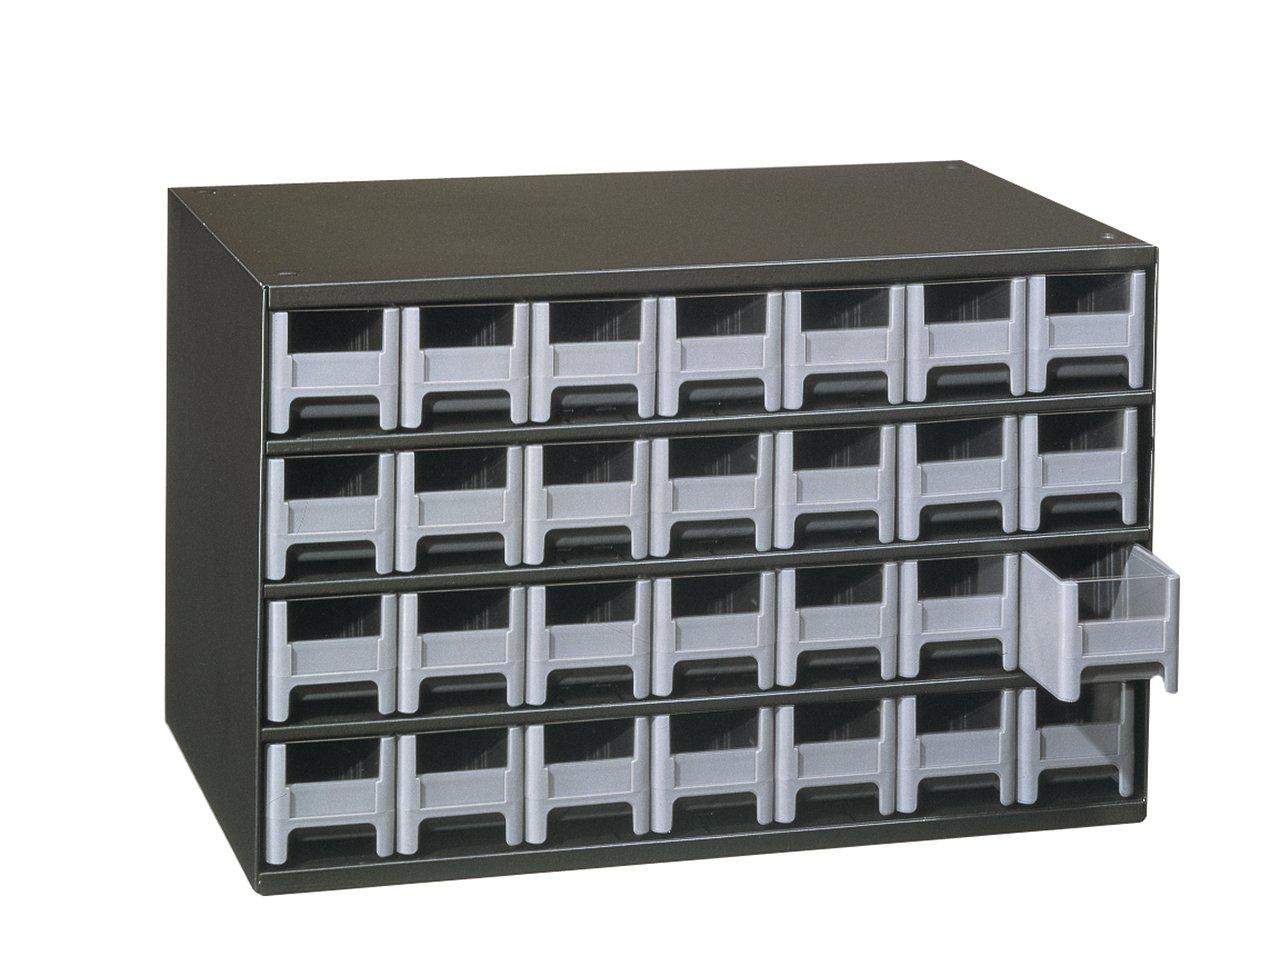 Akro-Mils 19228 28 Drawer Steel Parts Storage Hardware and Craft Cabinet, Grey Drawers